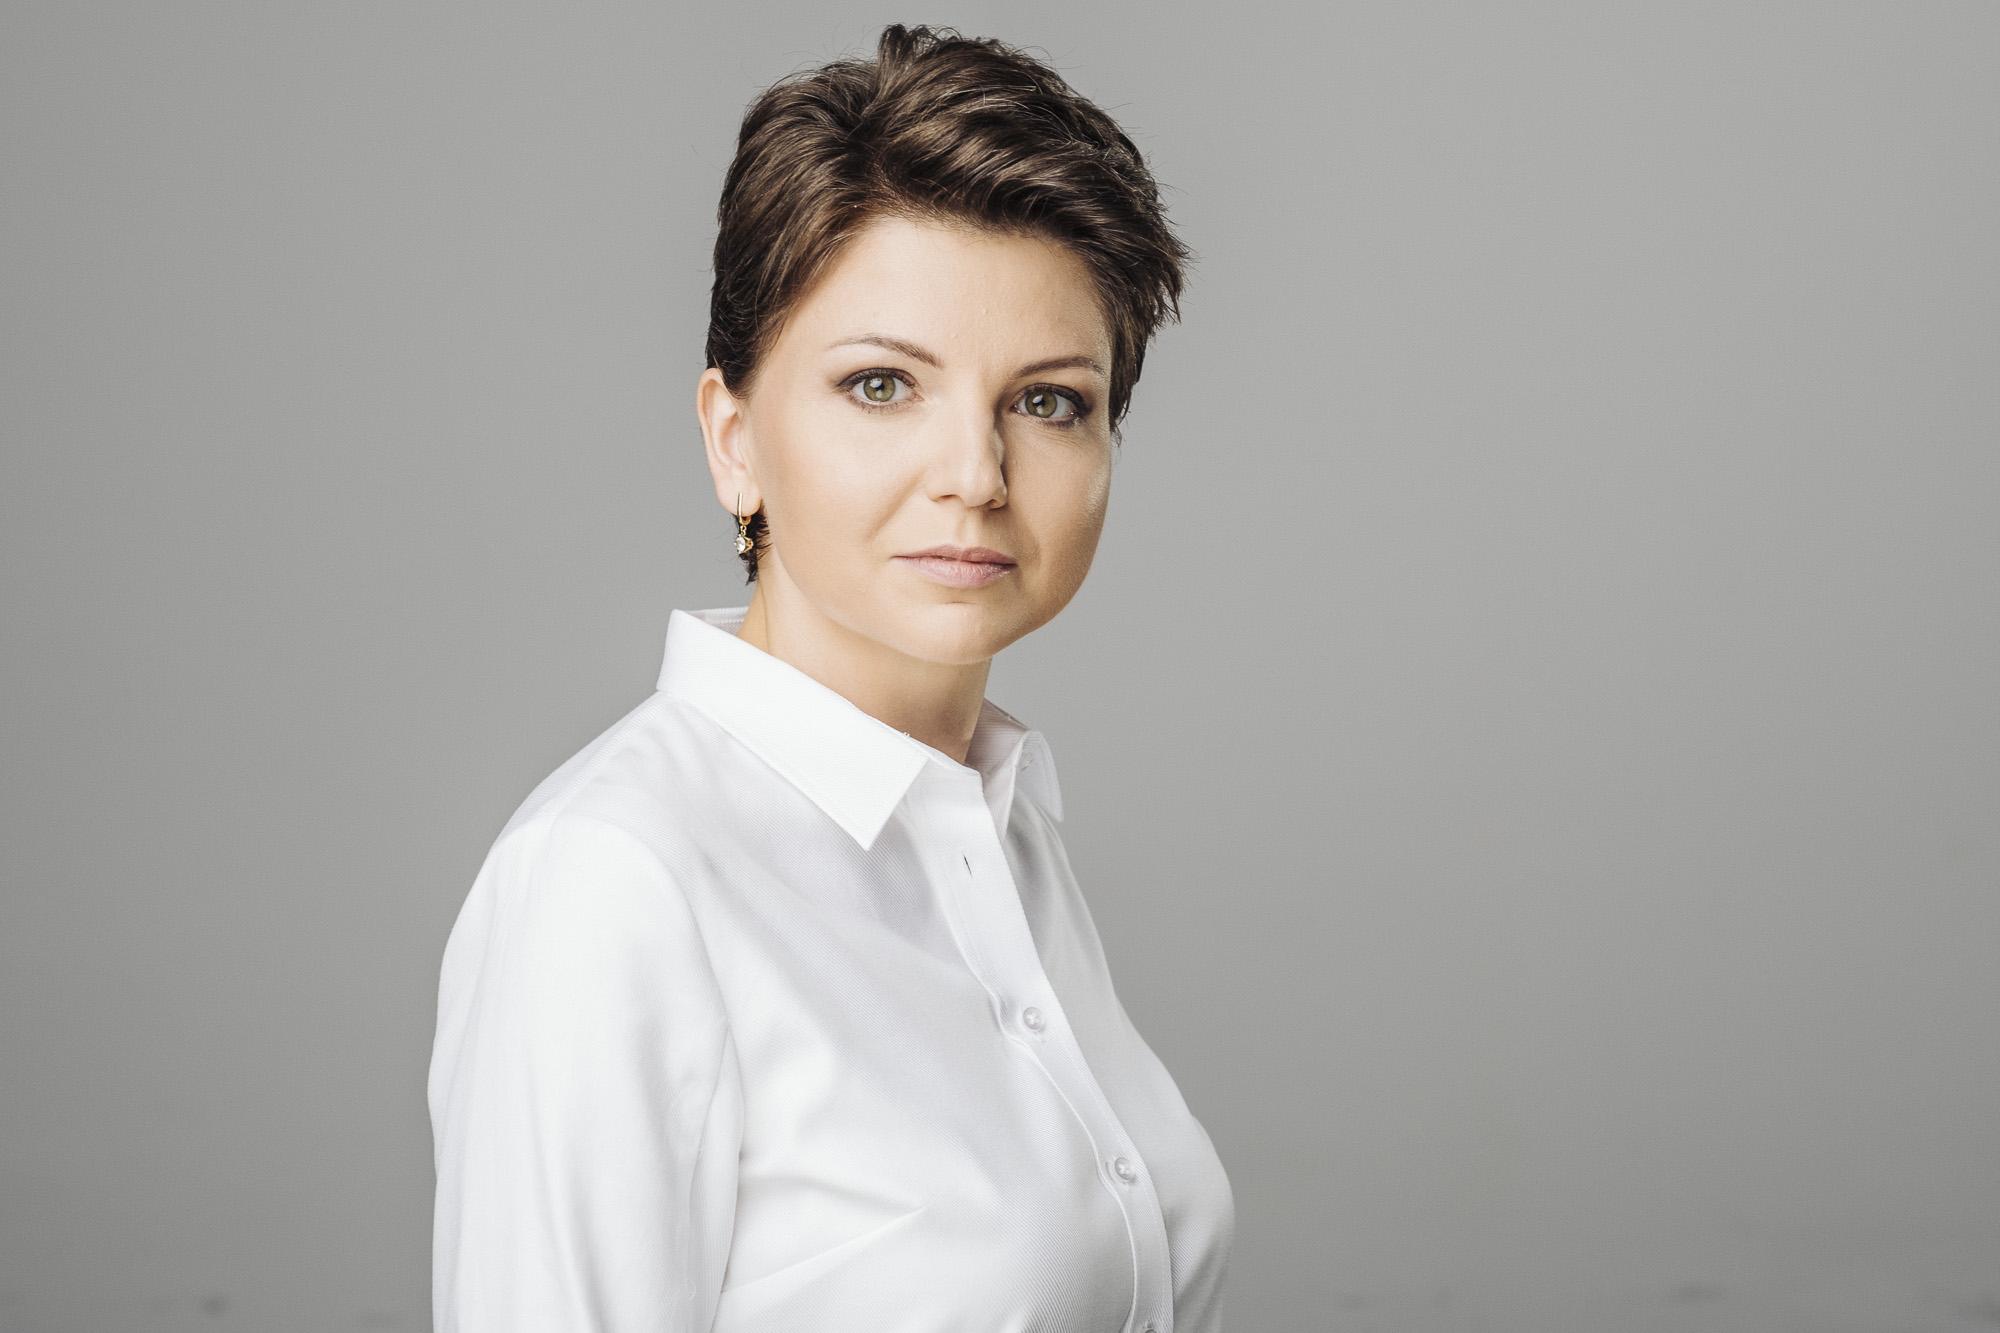 Monika Rosa, fot. archiwum prywatne